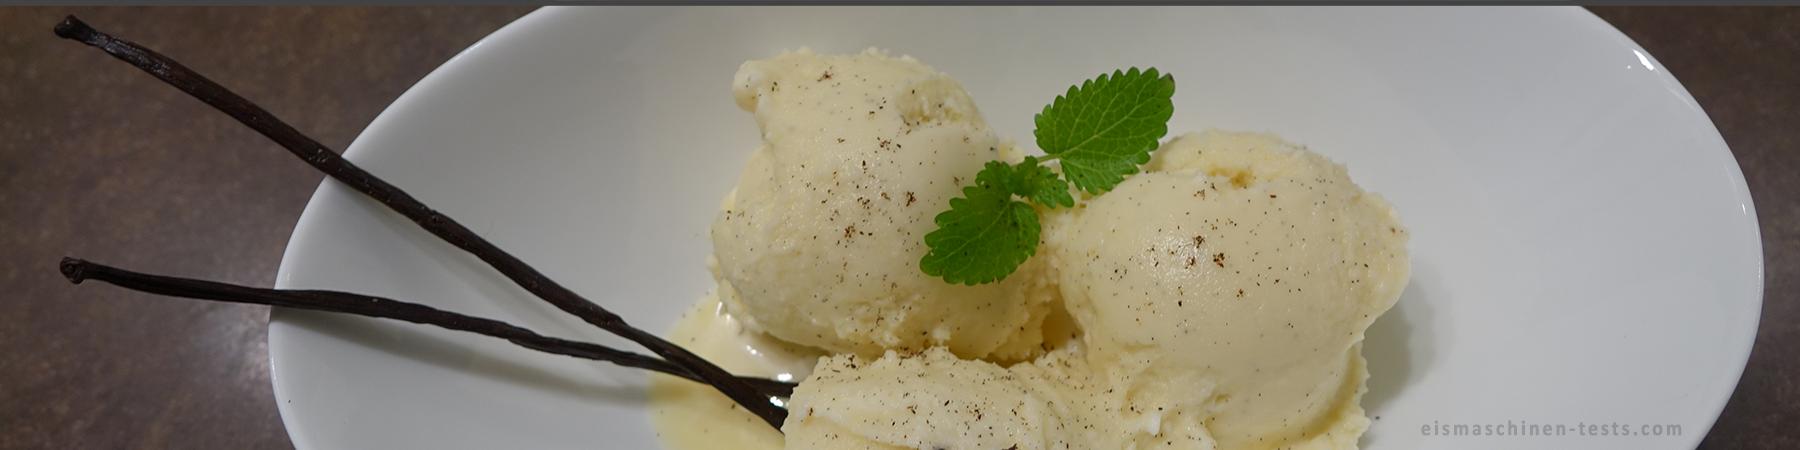 vanilleeis rezept zutaten zubereitung vanilleeis selber machen. Black Bedroom Furniture Sets. Home Design Ideas